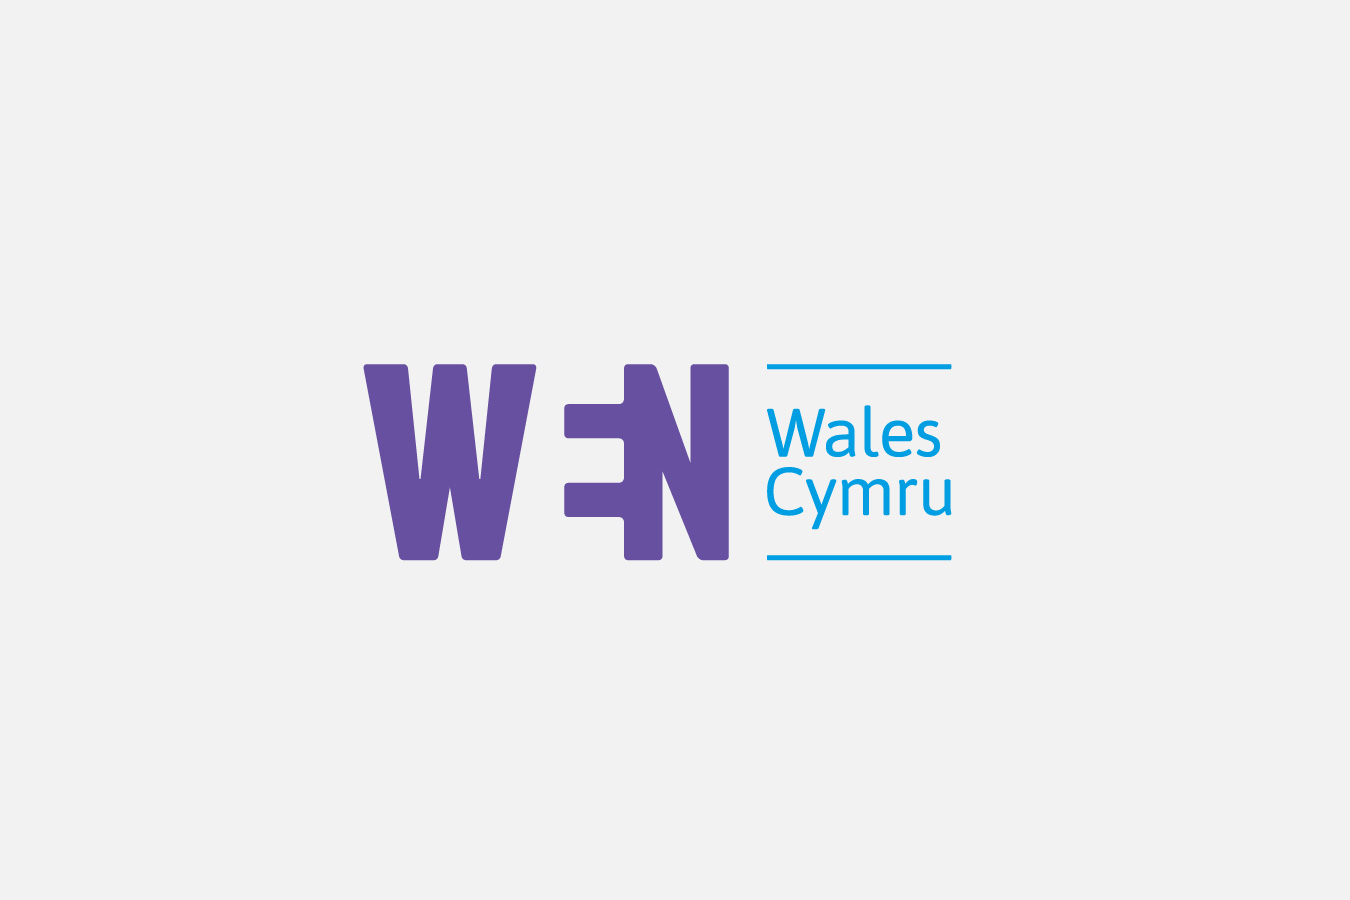 wen-wales-branding-hdd-1